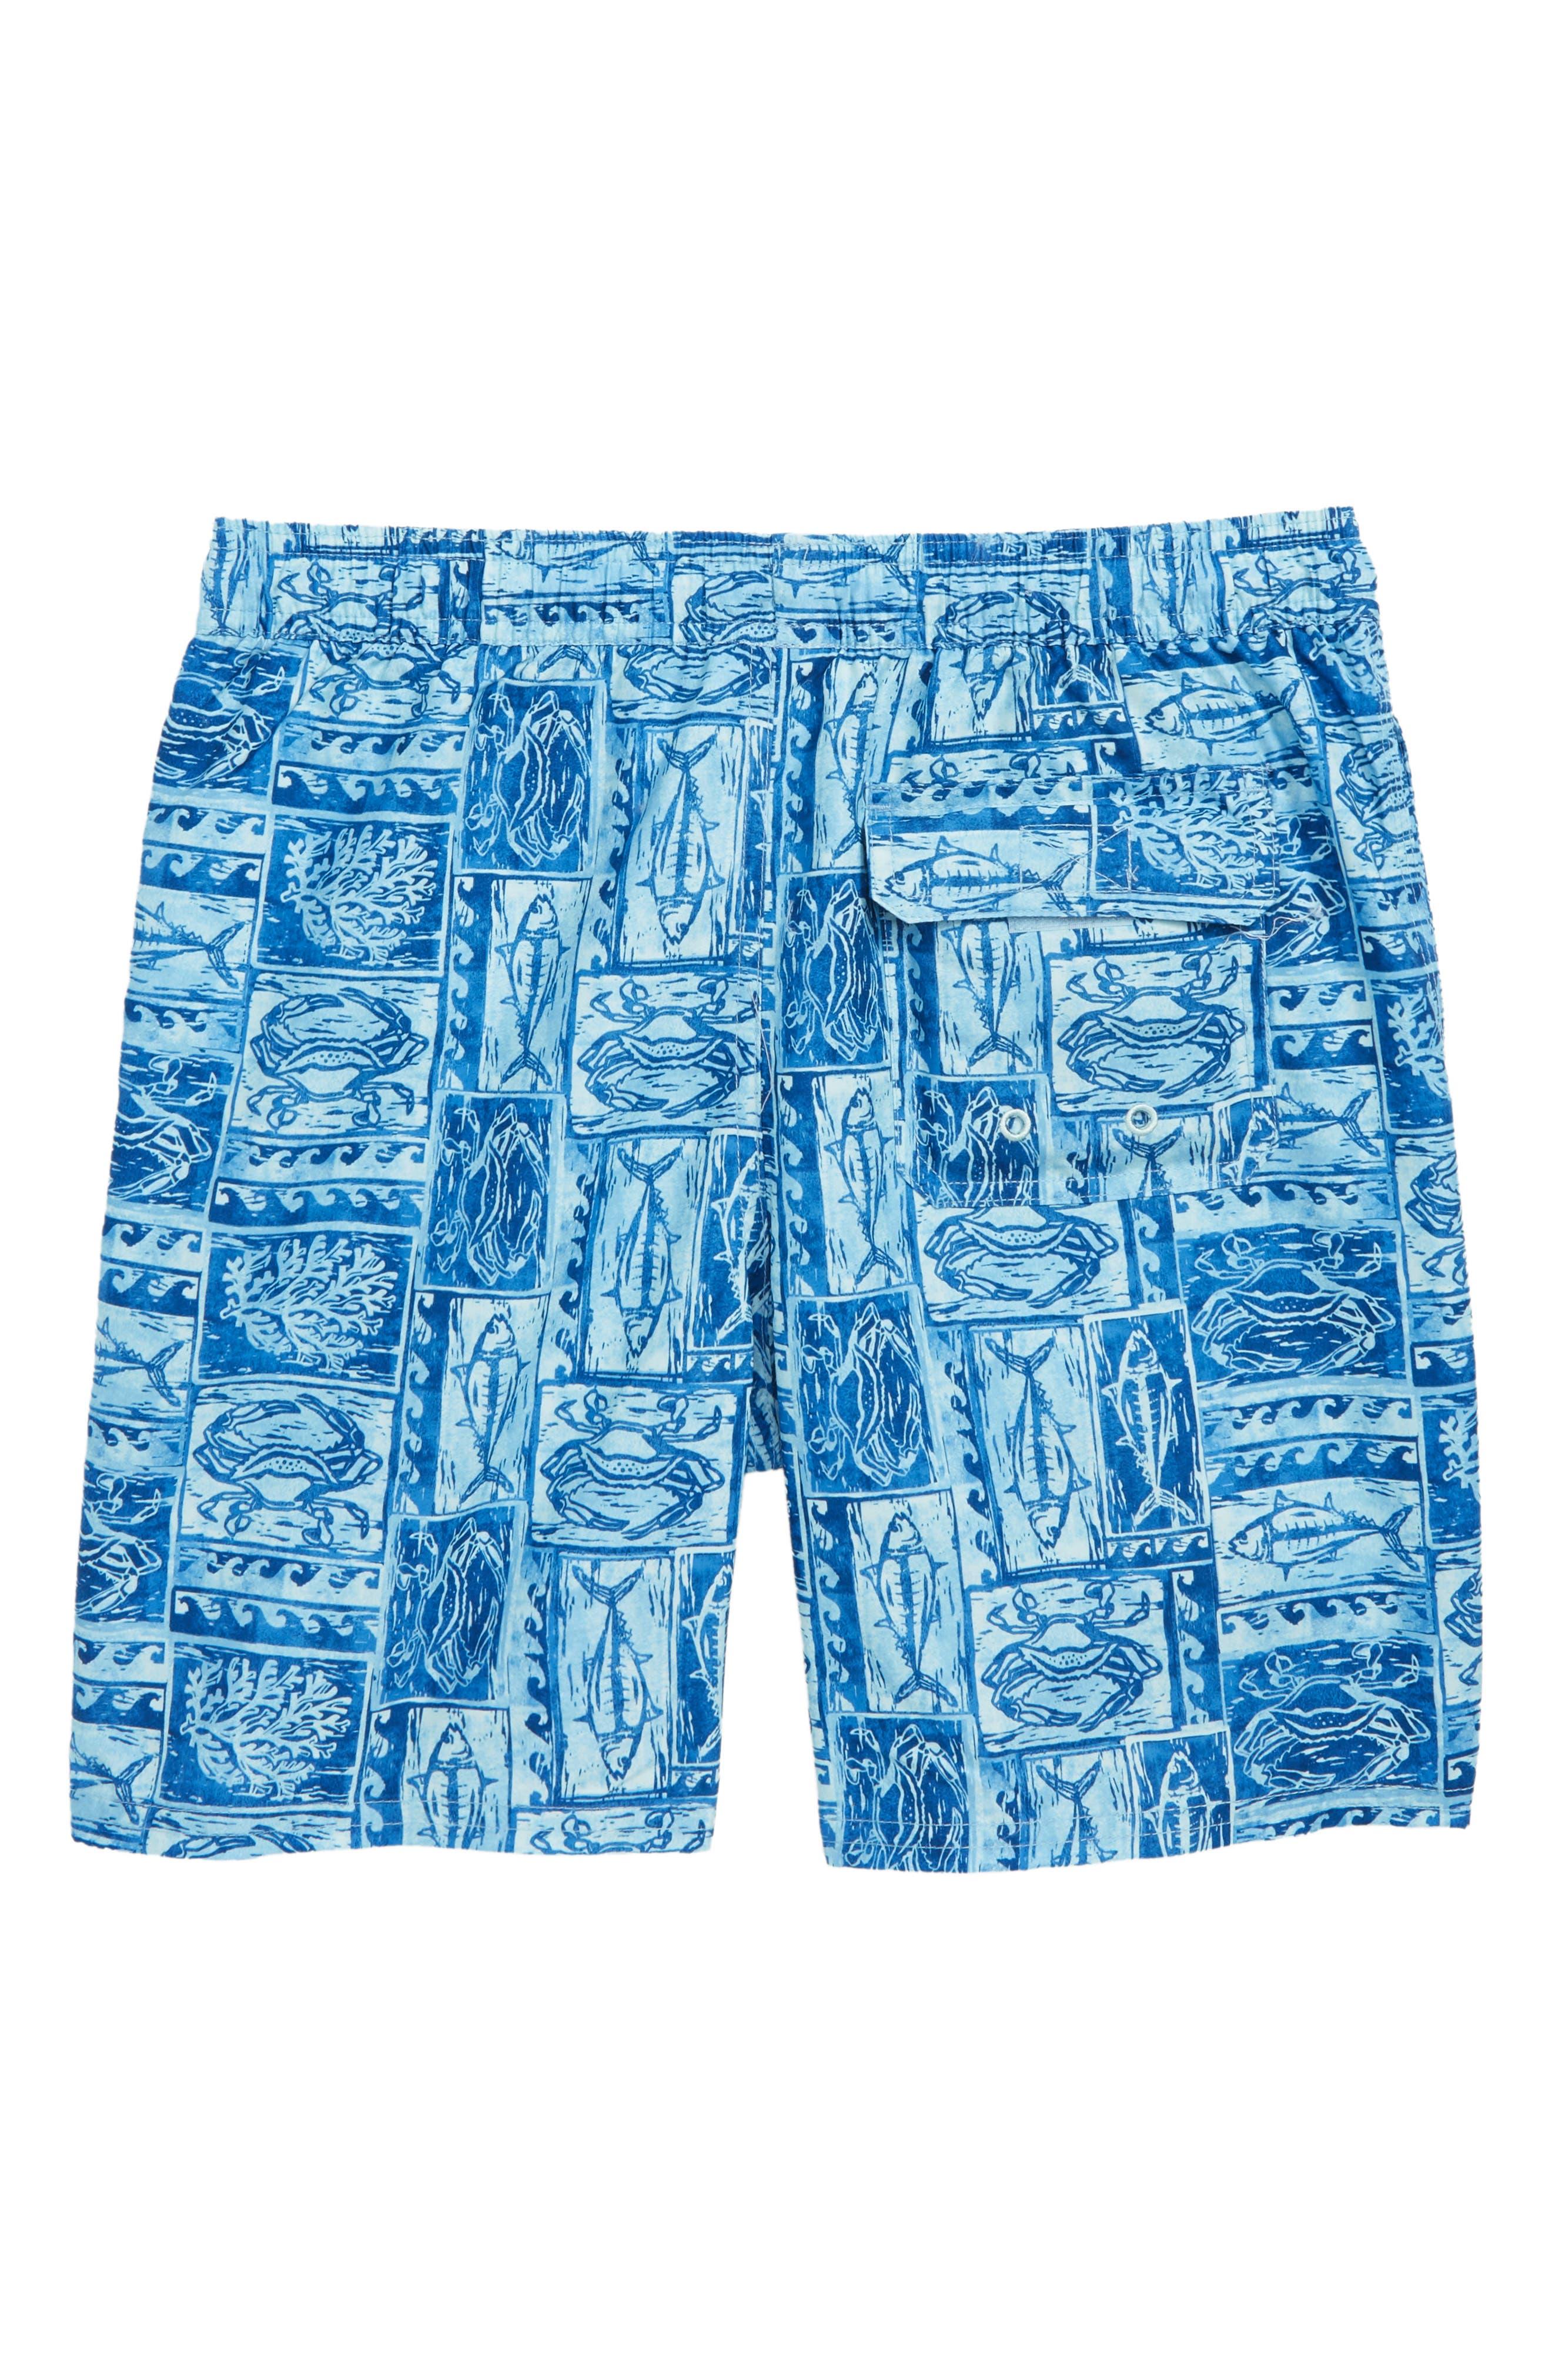 Chappy Woodblock Sea Life Swim Trunks,                             Alternate thumbnail 2, color,                             JAKE BLUE